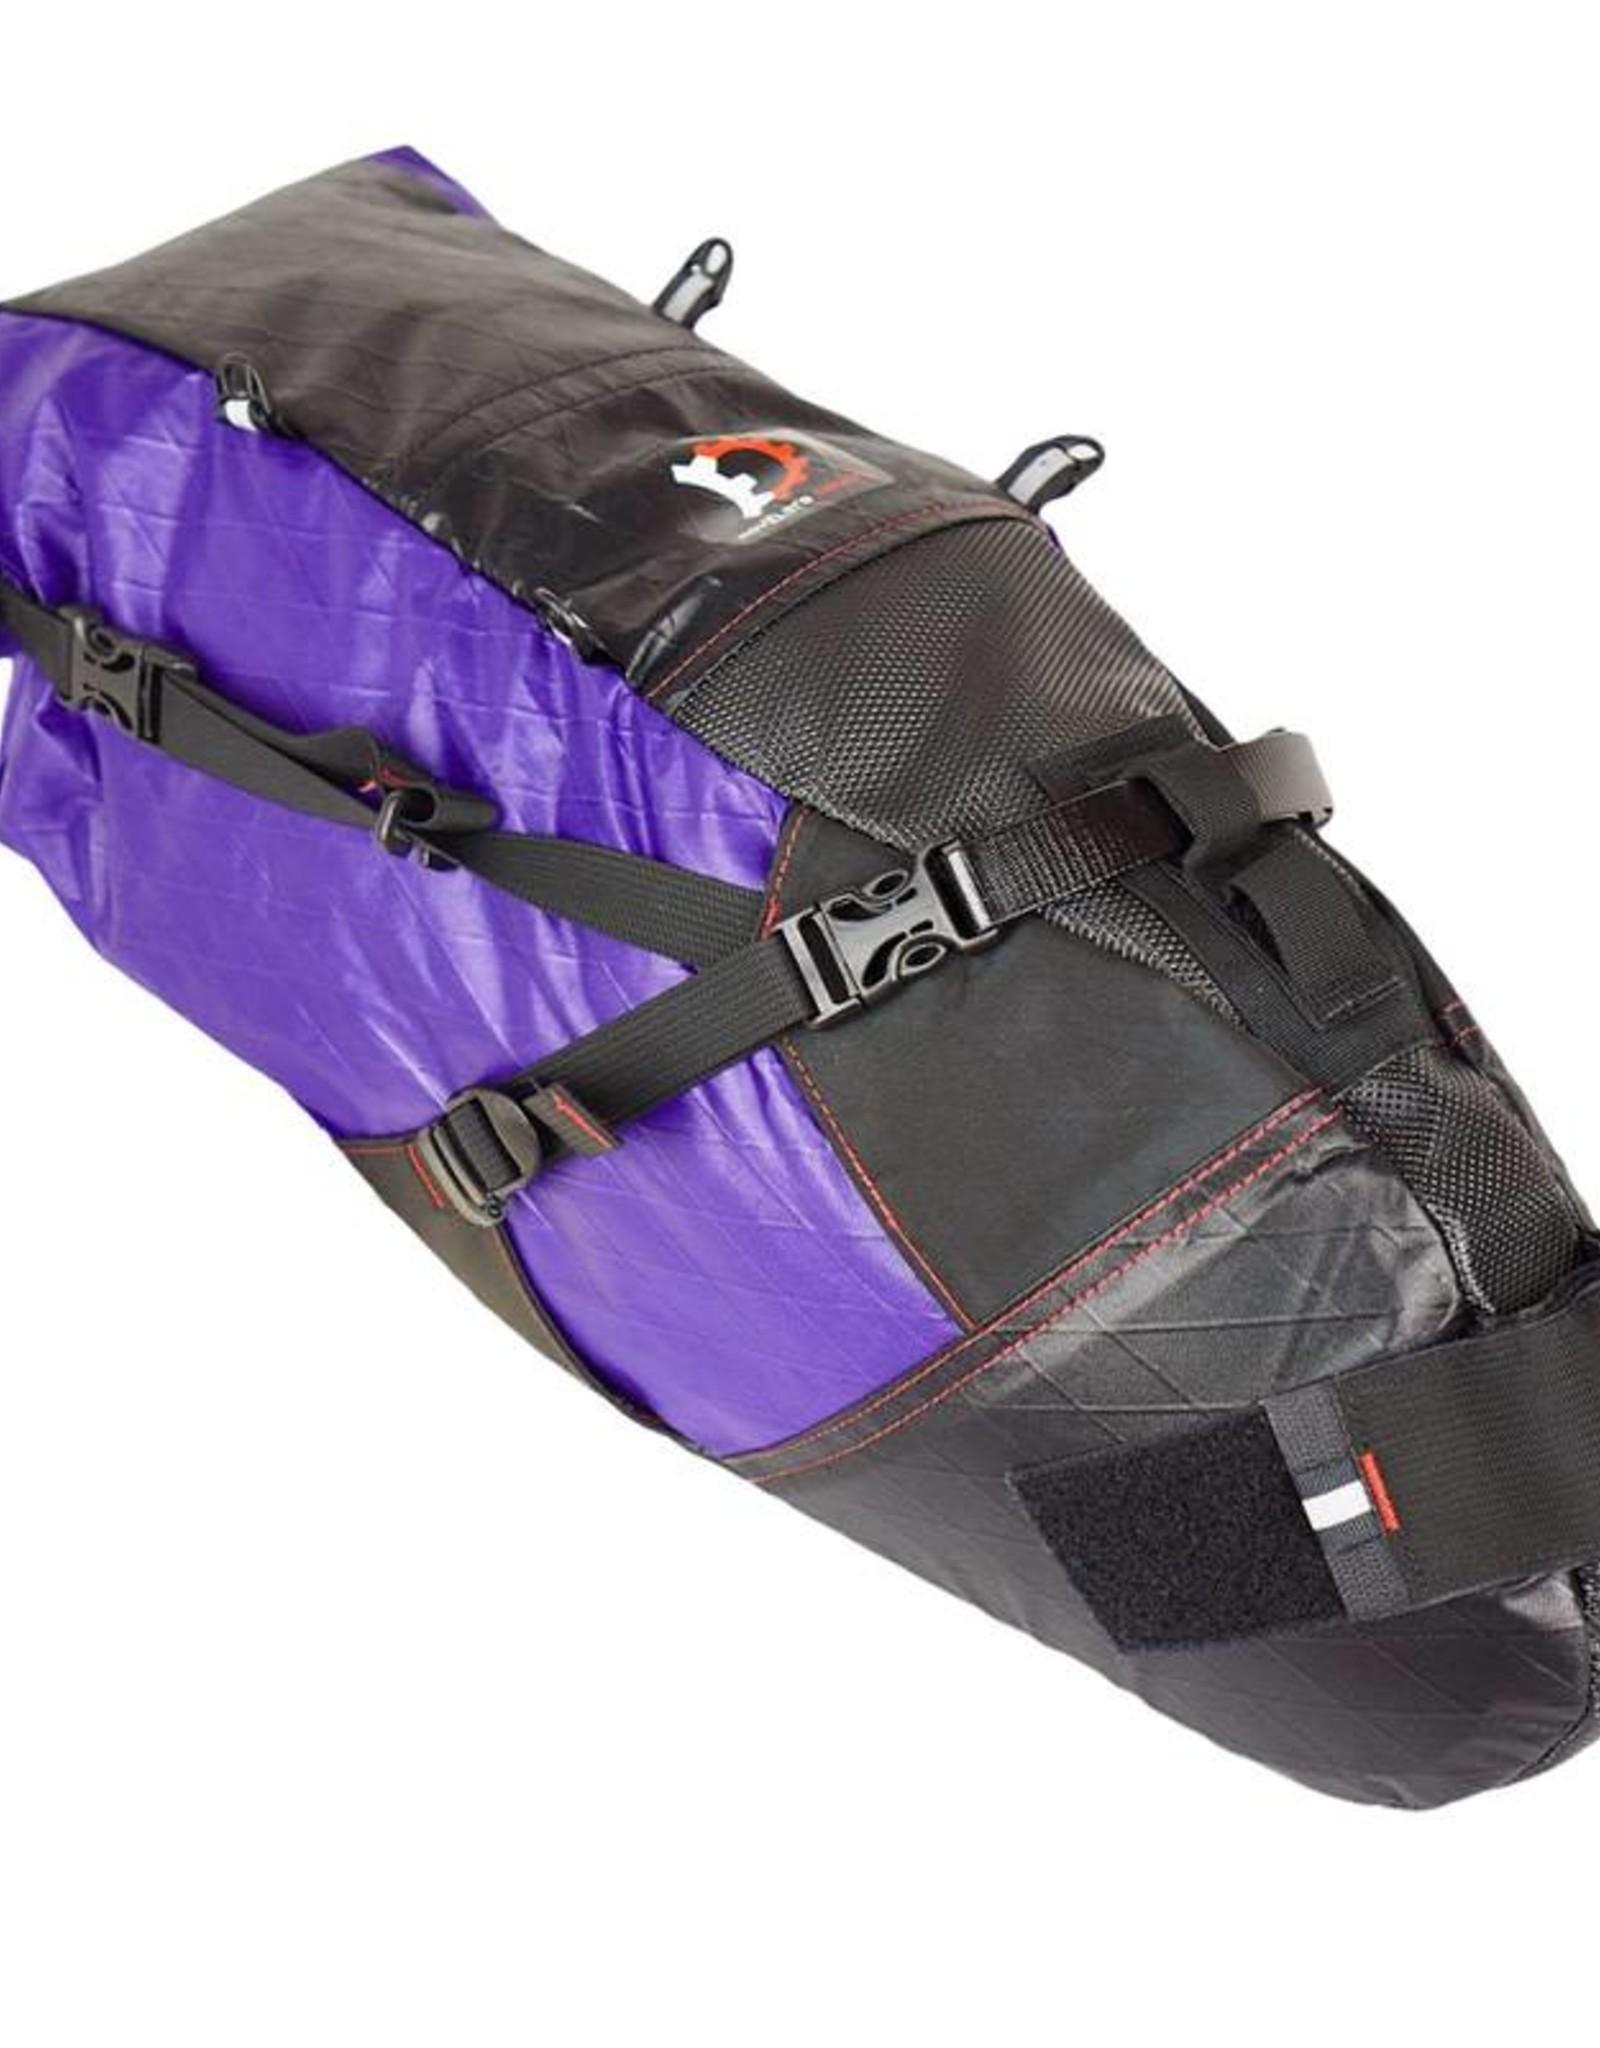 Revelate Designs Revelate Designs Viscacha Seat Bag, Crush